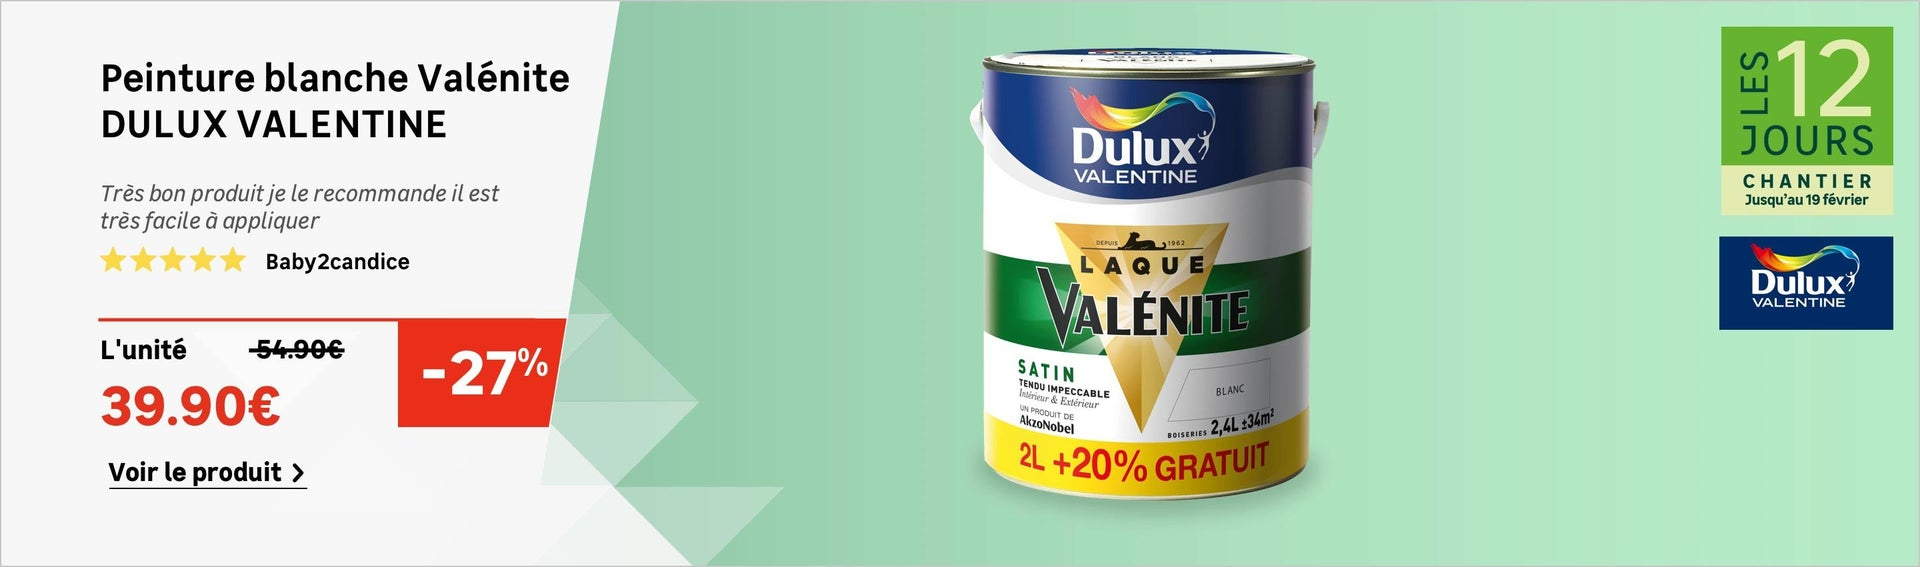 peinture intrieure peinture valnite dulux valentine - Meilleur Marque De Peinture Interieur